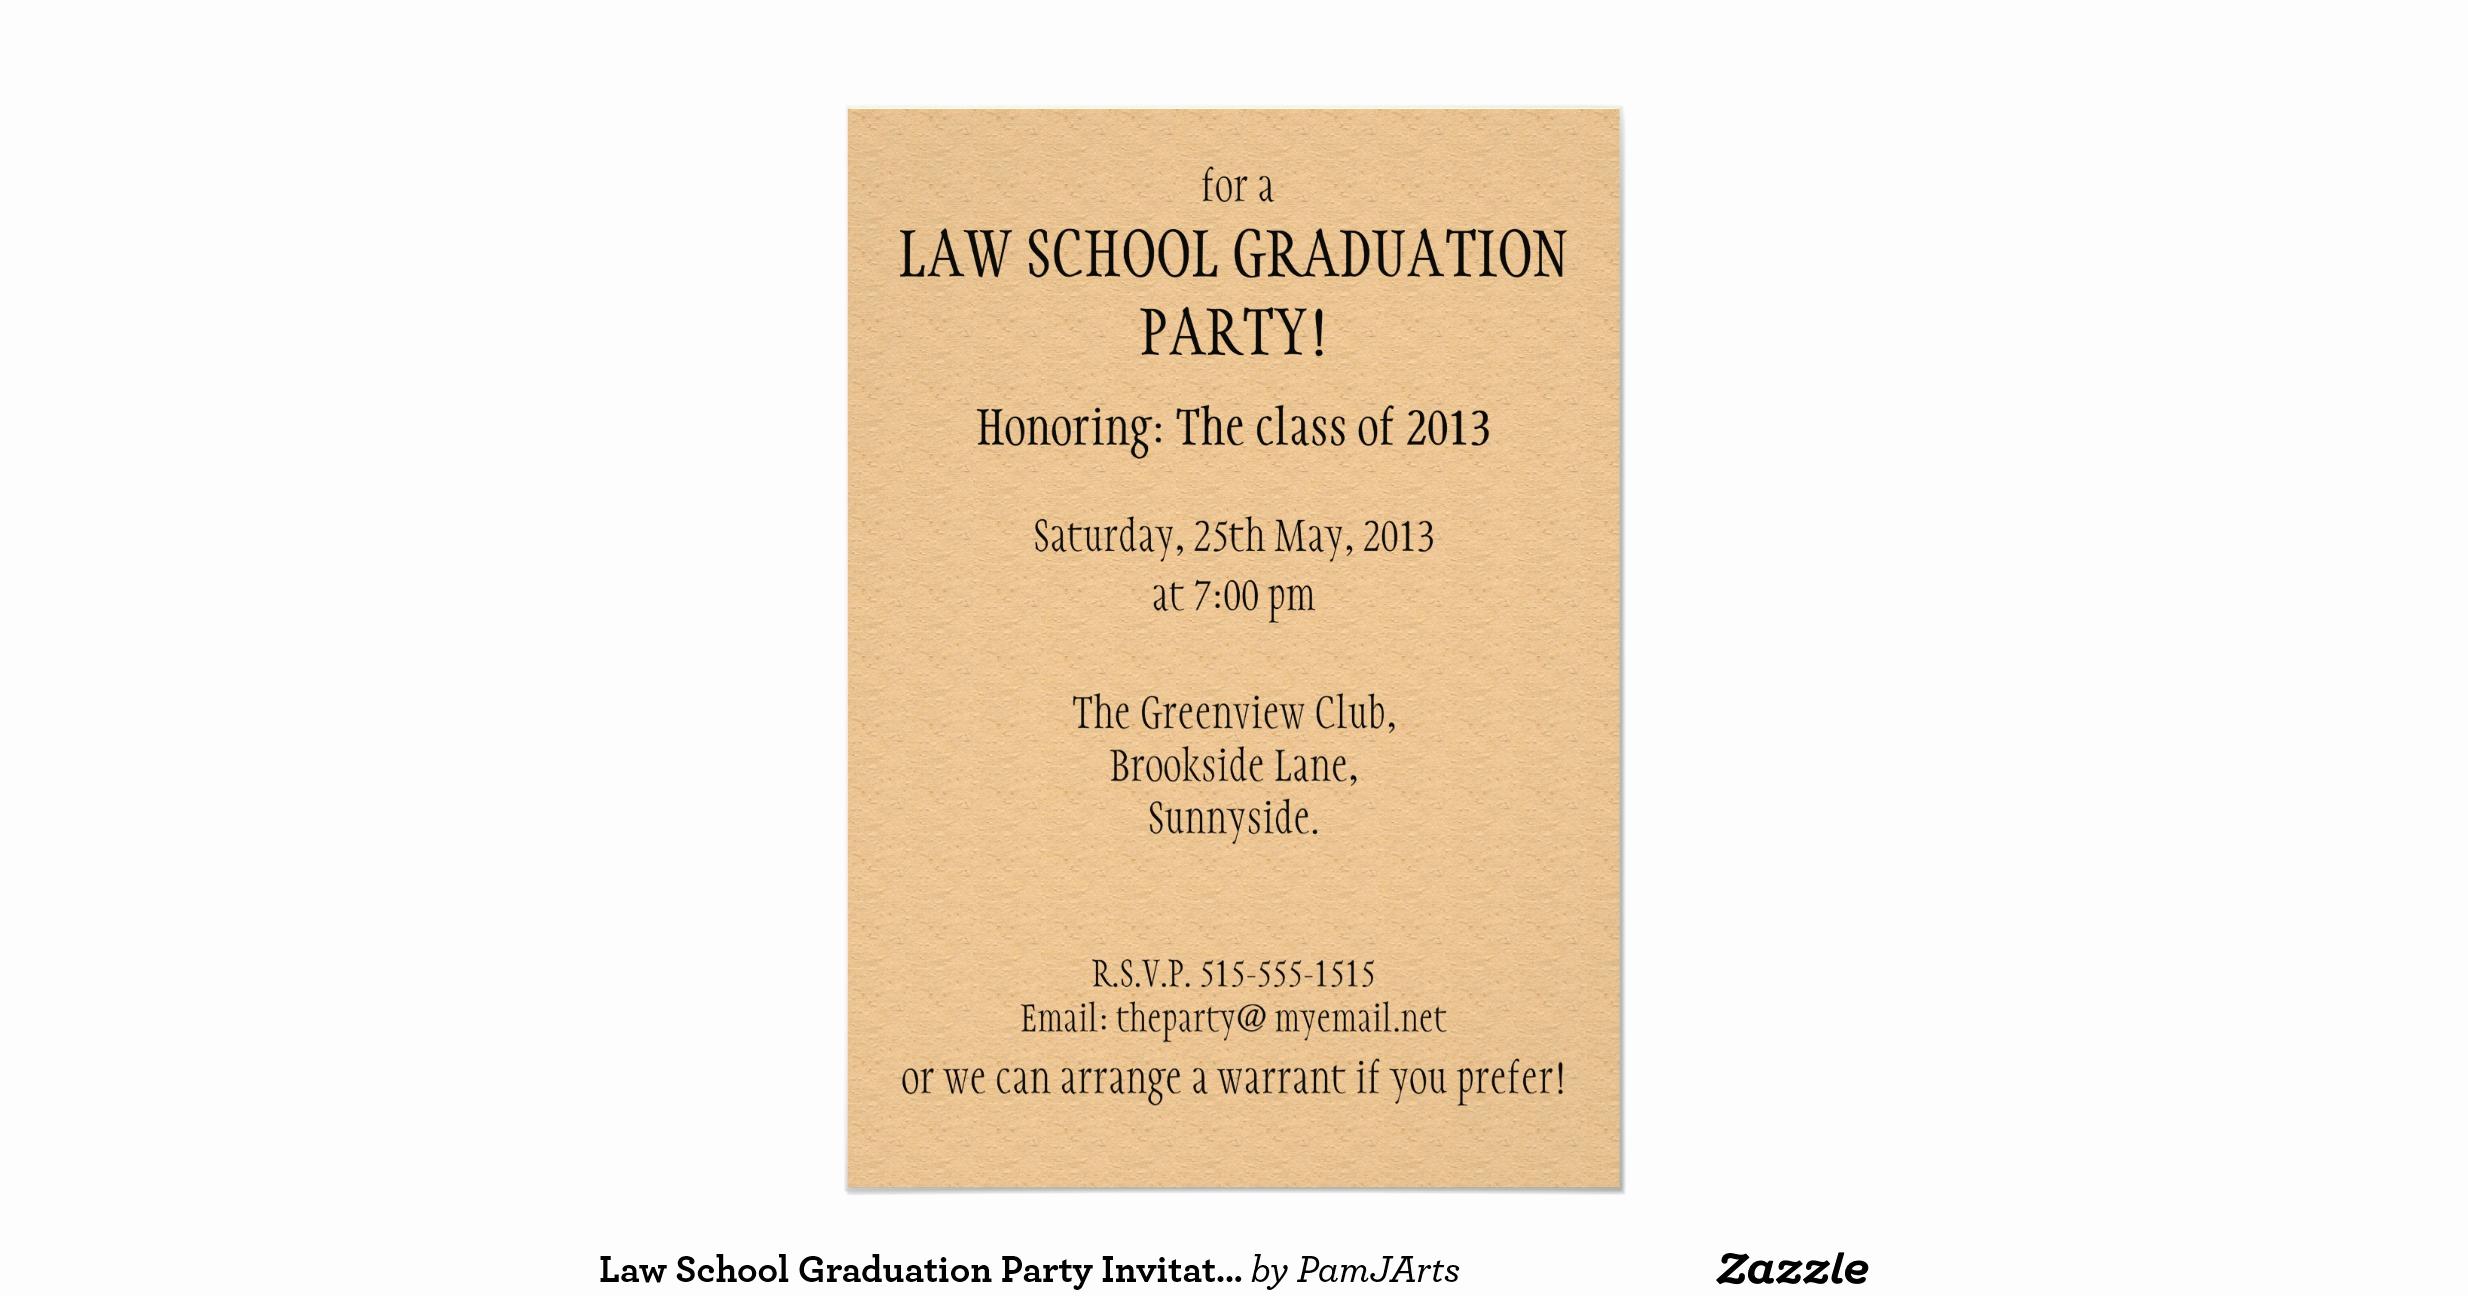 Law School Graduation Announcements Lovely Law School Graduation Party Invitation Summons